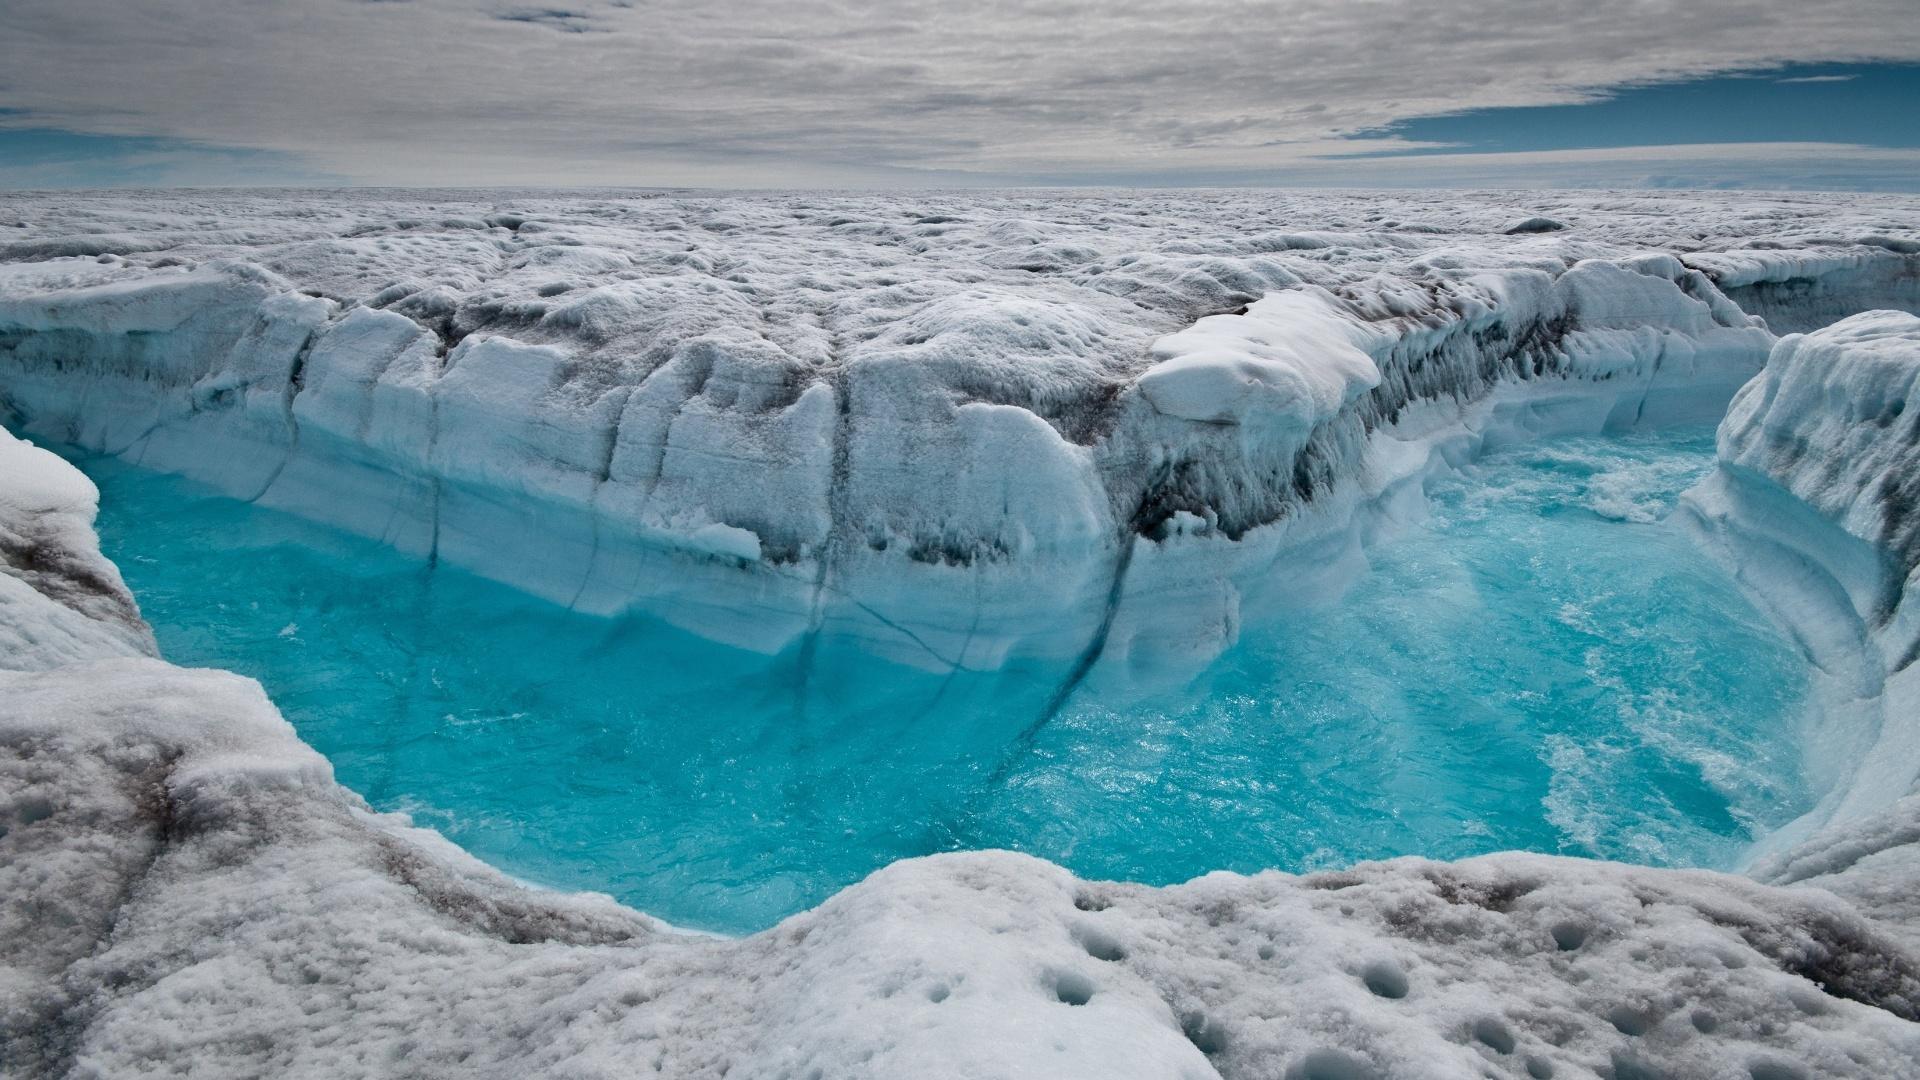 Degelo pode liberar dejetos radioativos enterrados sob o gelo da Groelândia  - 05/08/2016 - UOL Notícias